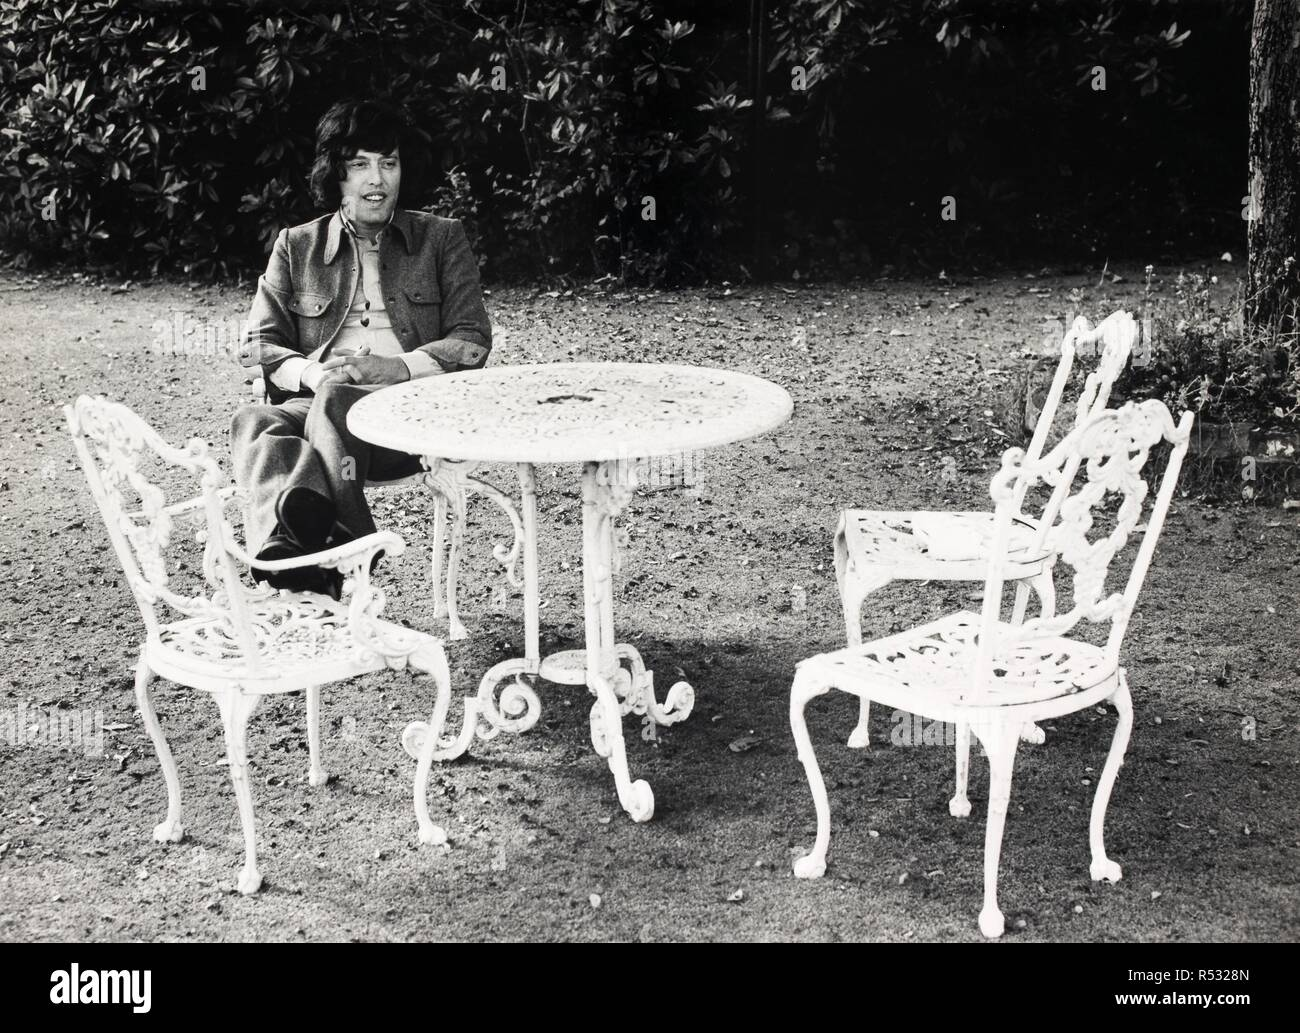 Tom Stoppard. Monochrome. Source: FG2101-6-27. - Stock Image